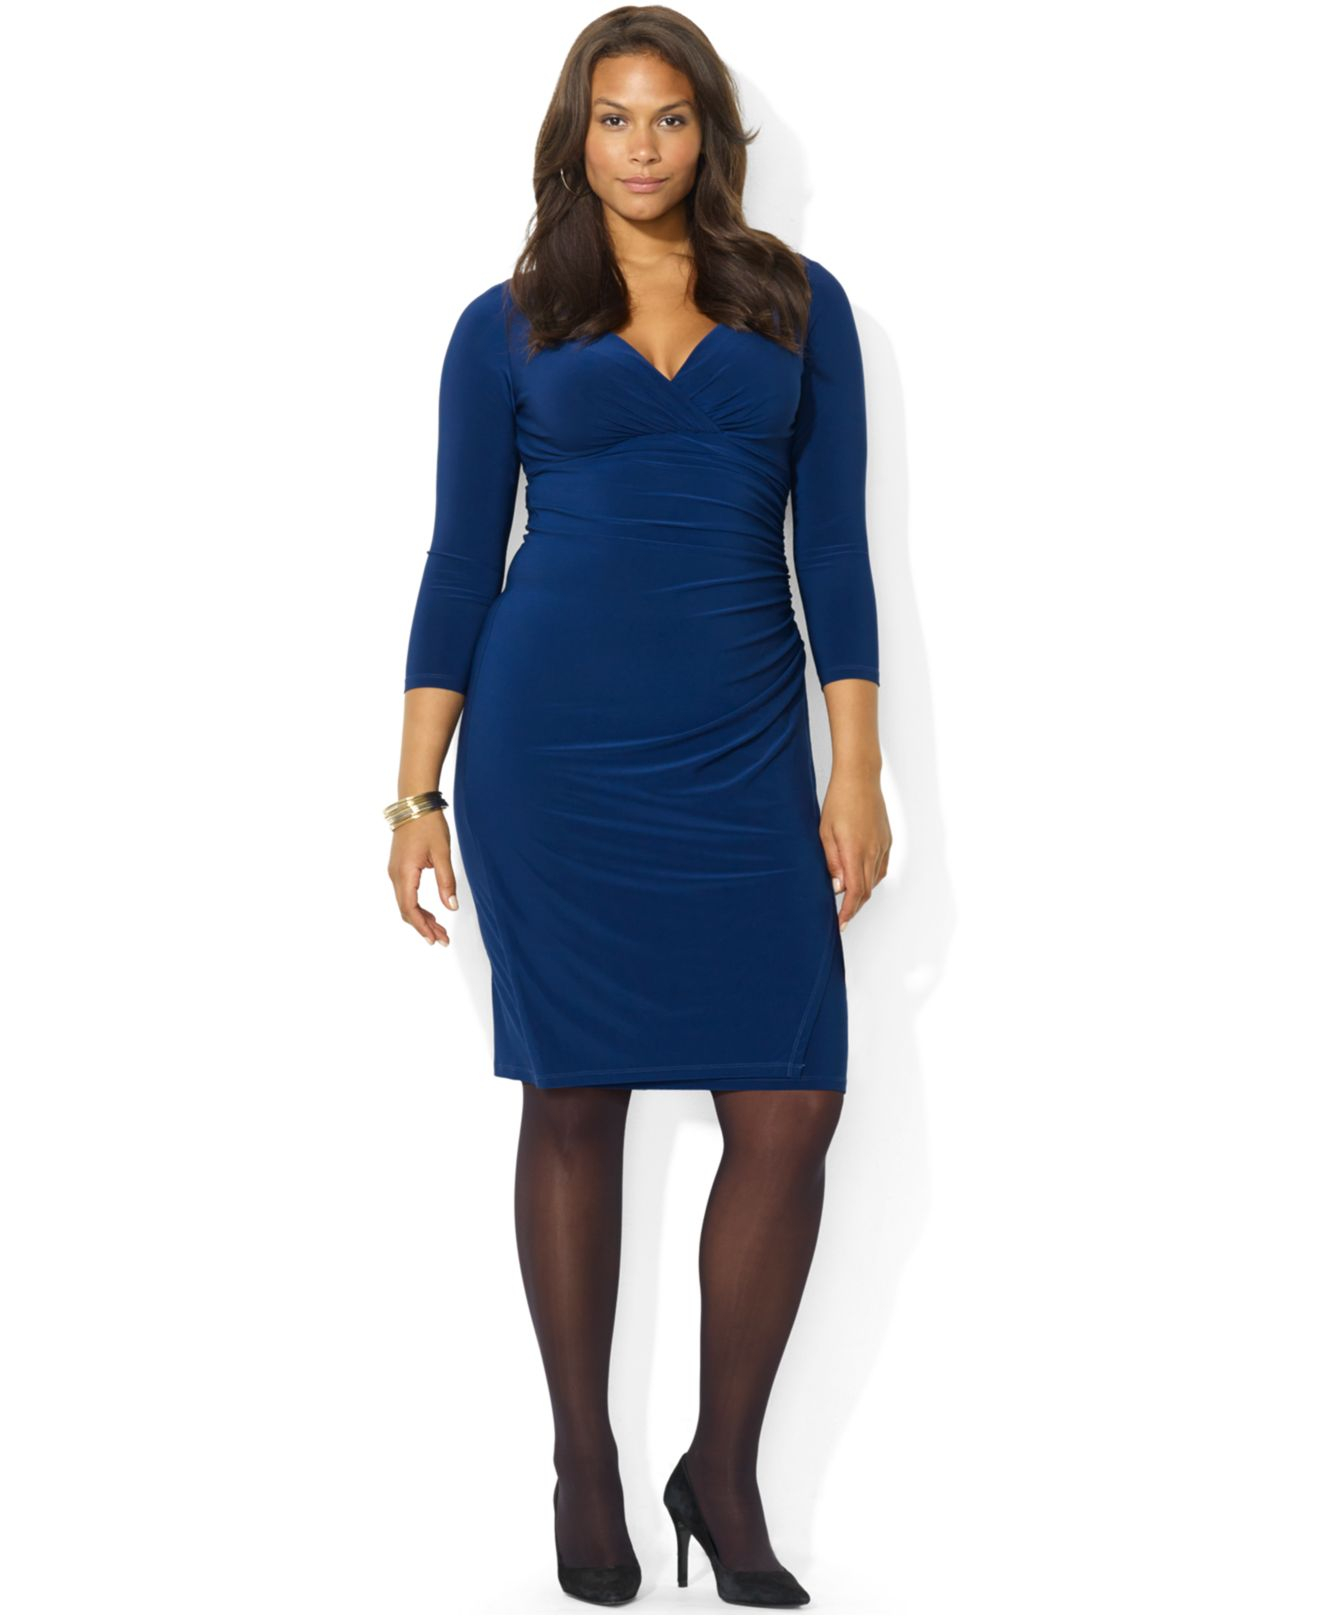 Lauren by Ralph Lauren Blue Plus Size Long-Sleeve Ruched Jersey Dress